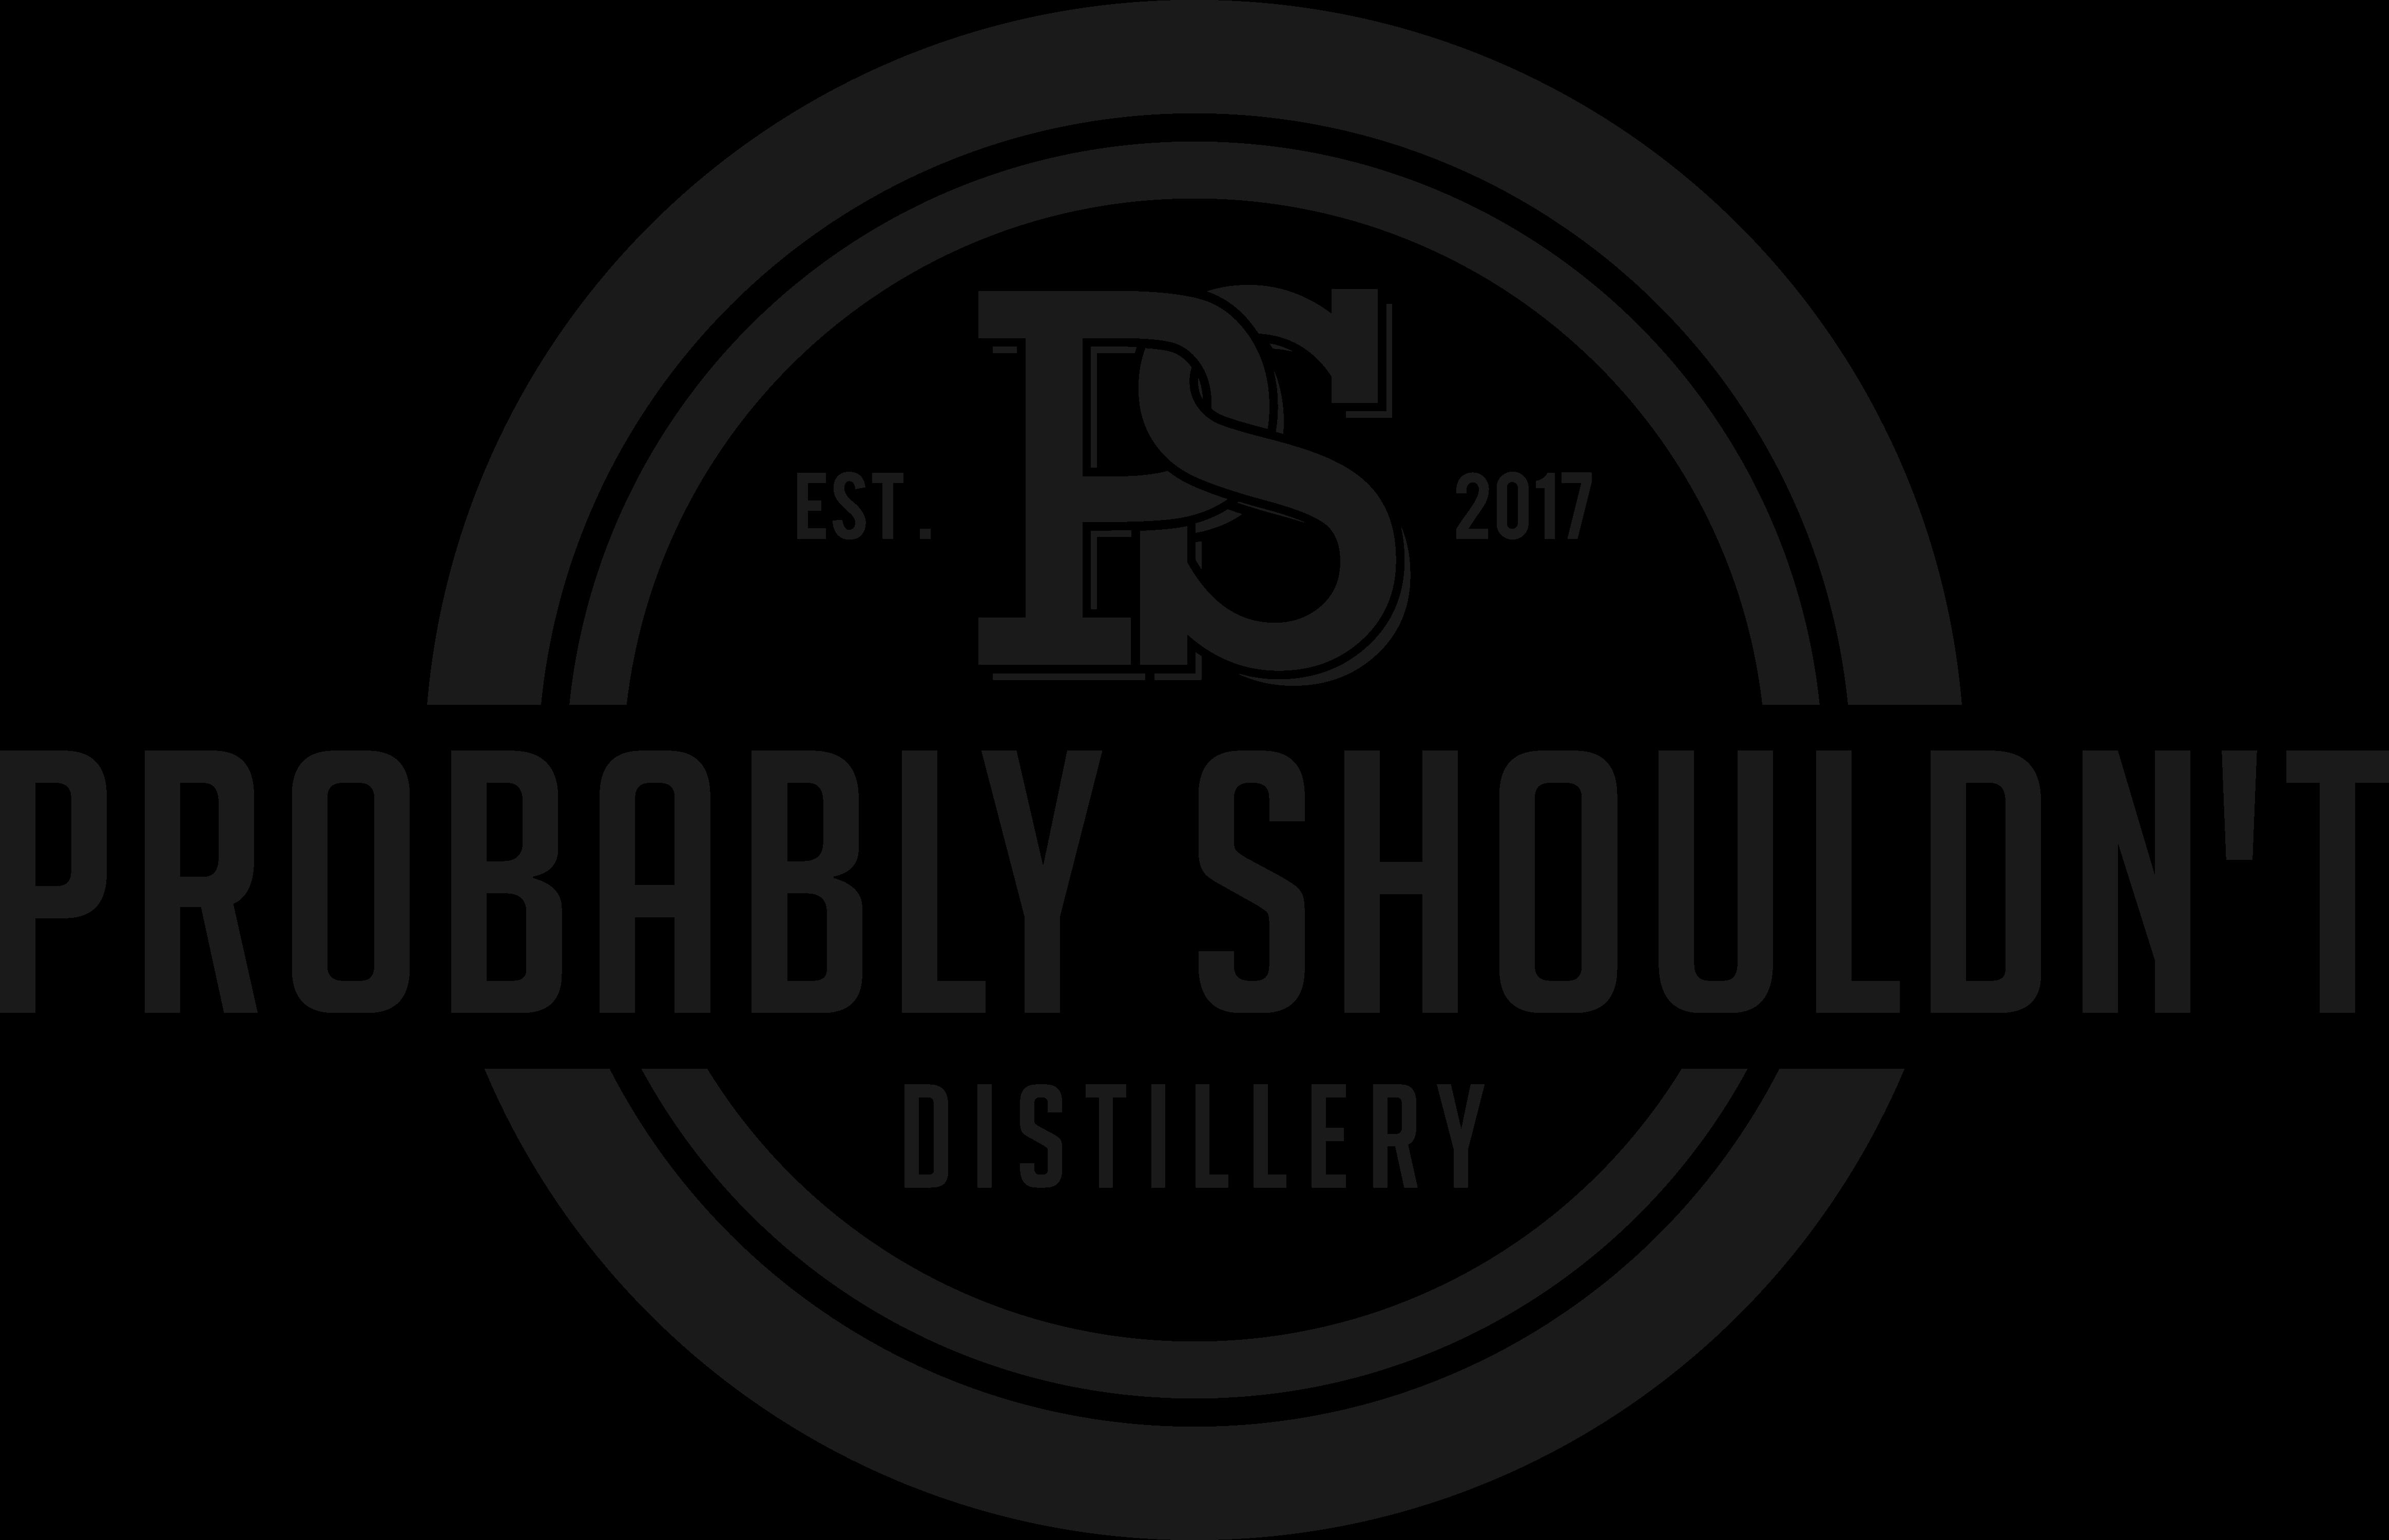 Probably Shouldn't Distillery